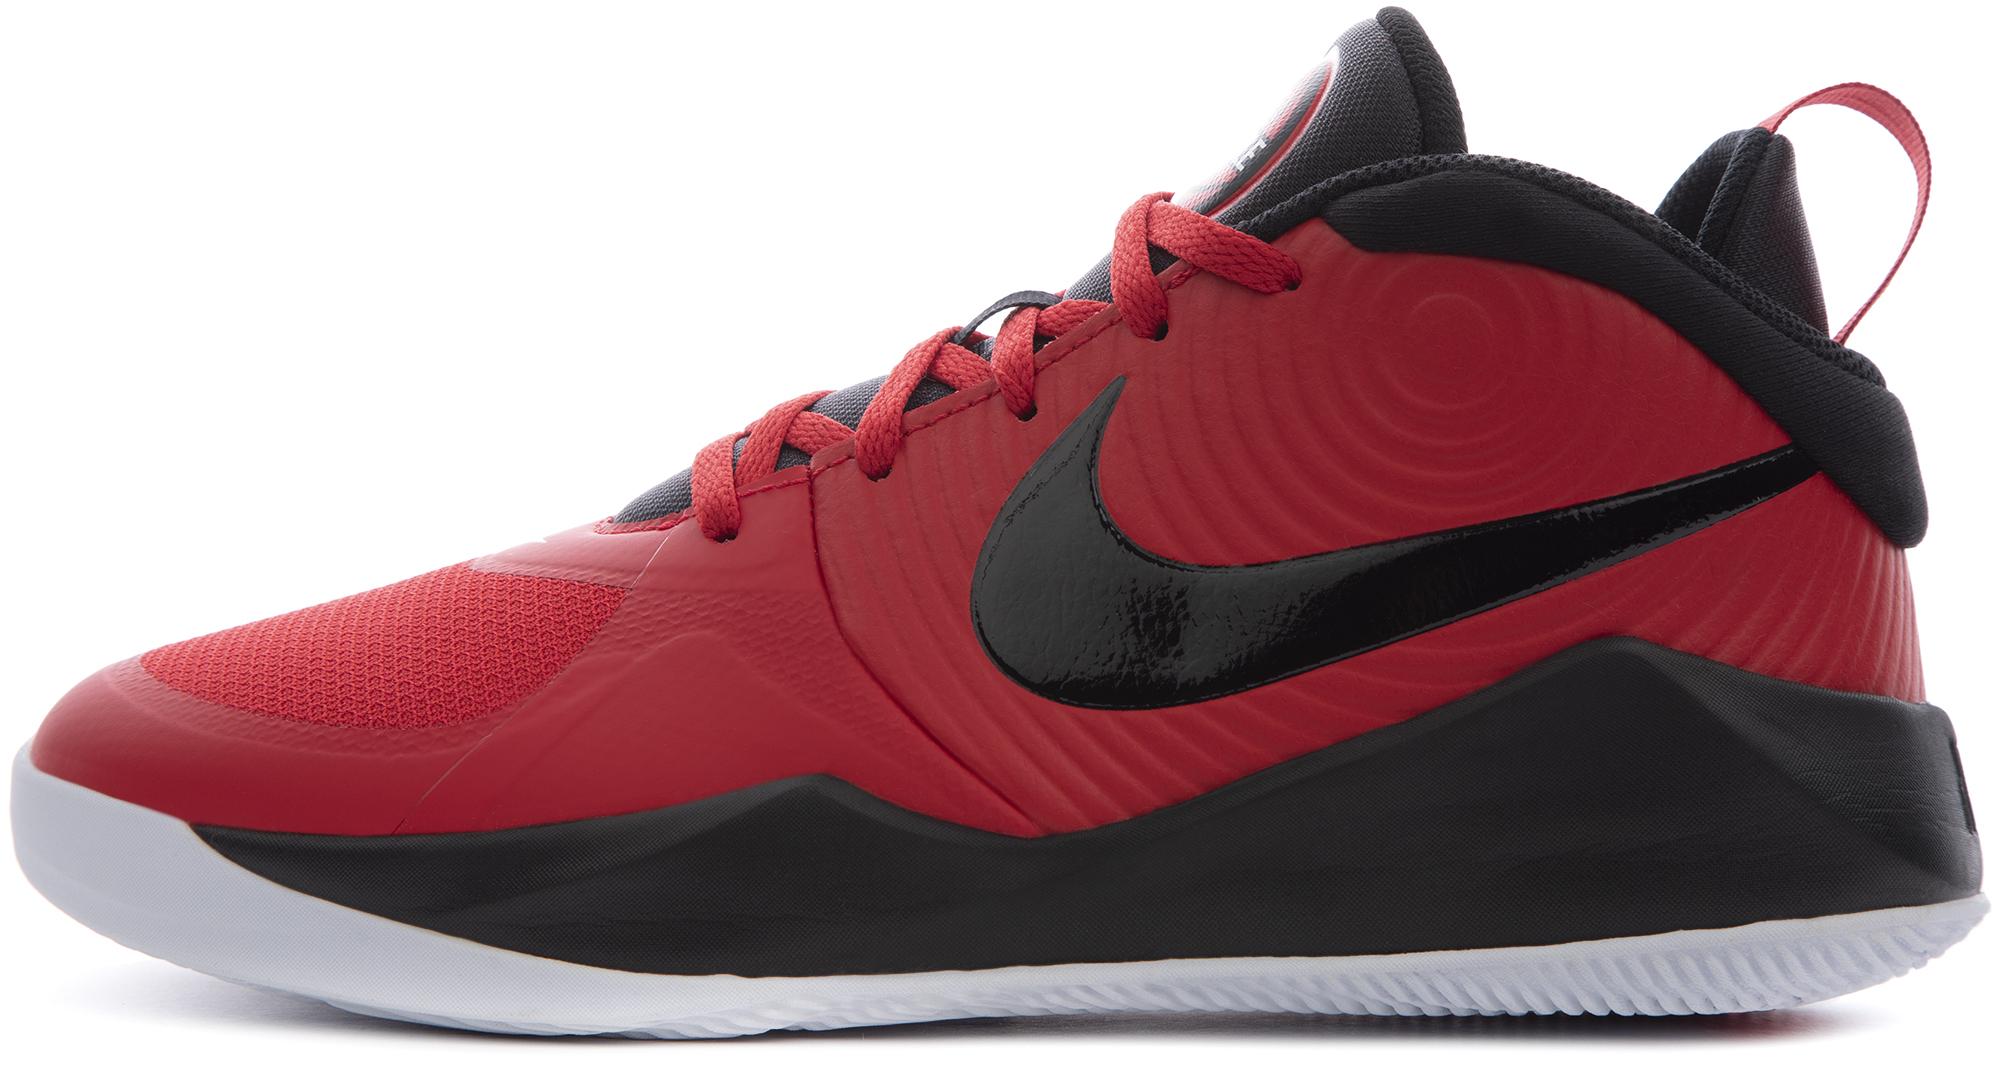 Nike Кроссовки для мальчиков Nike Team Hustle D 9 (Gs), размер 37,5 nike catalyst team soccer ball